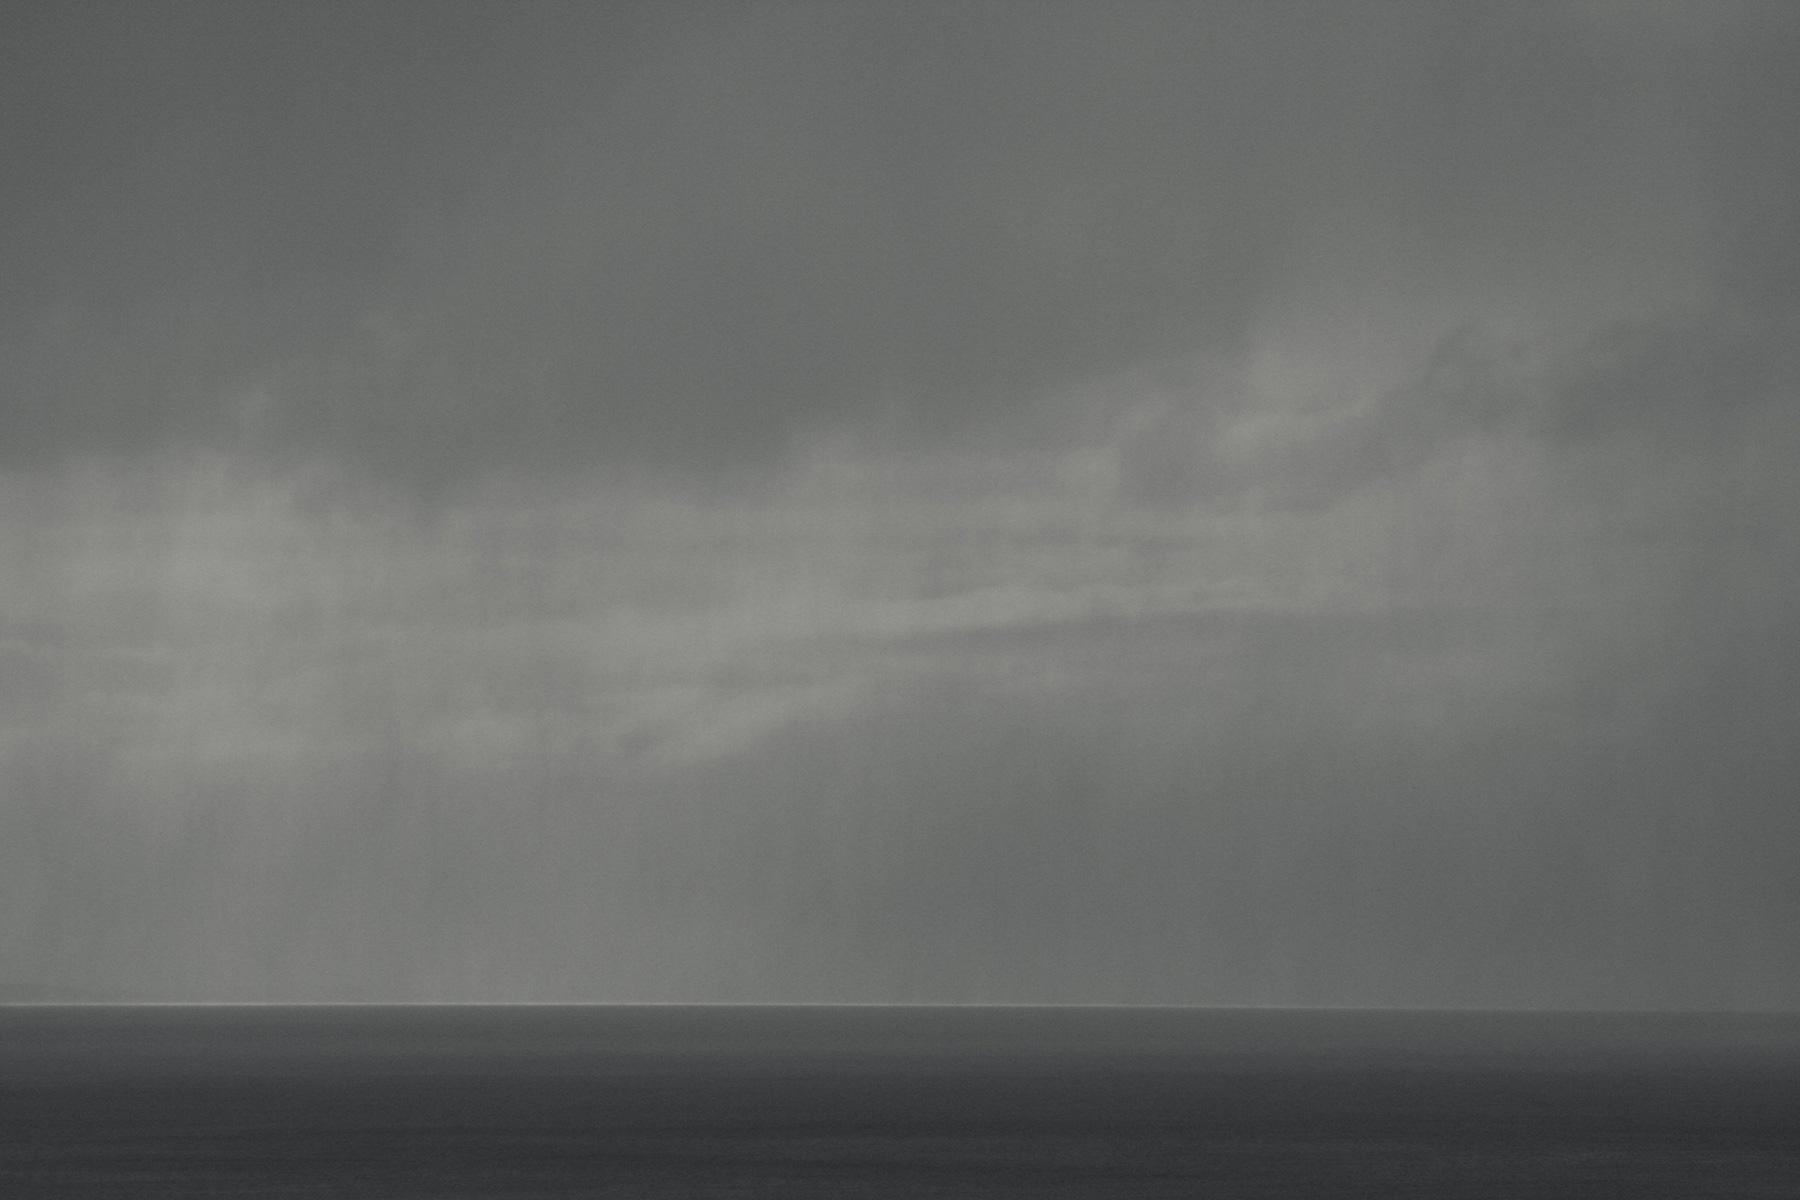 039-Seascape-1-120x90-cm-16.jpg